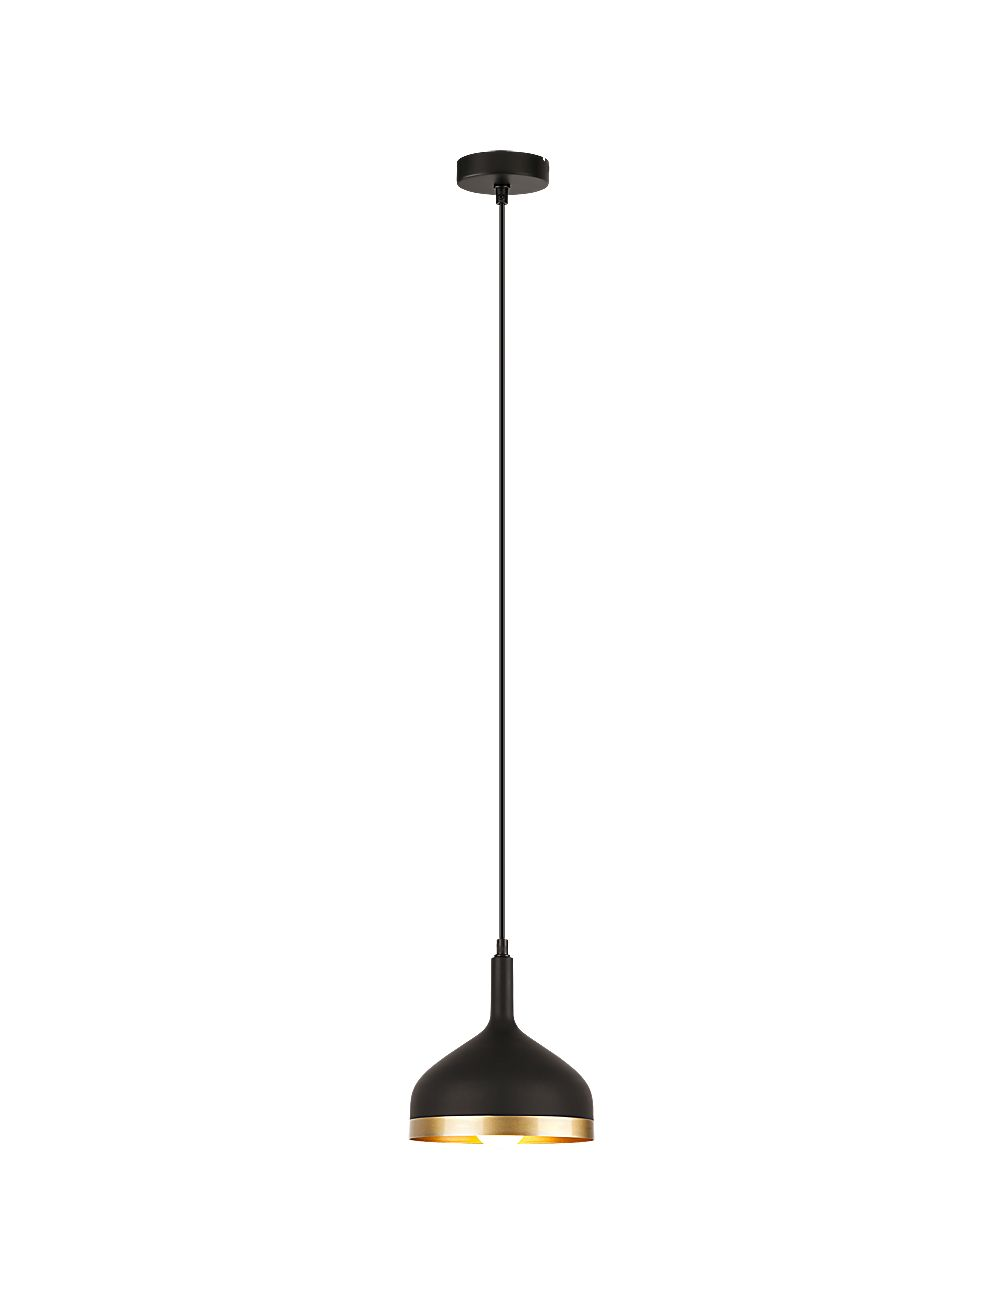 2710 Kevin lampa czarna Rabalux